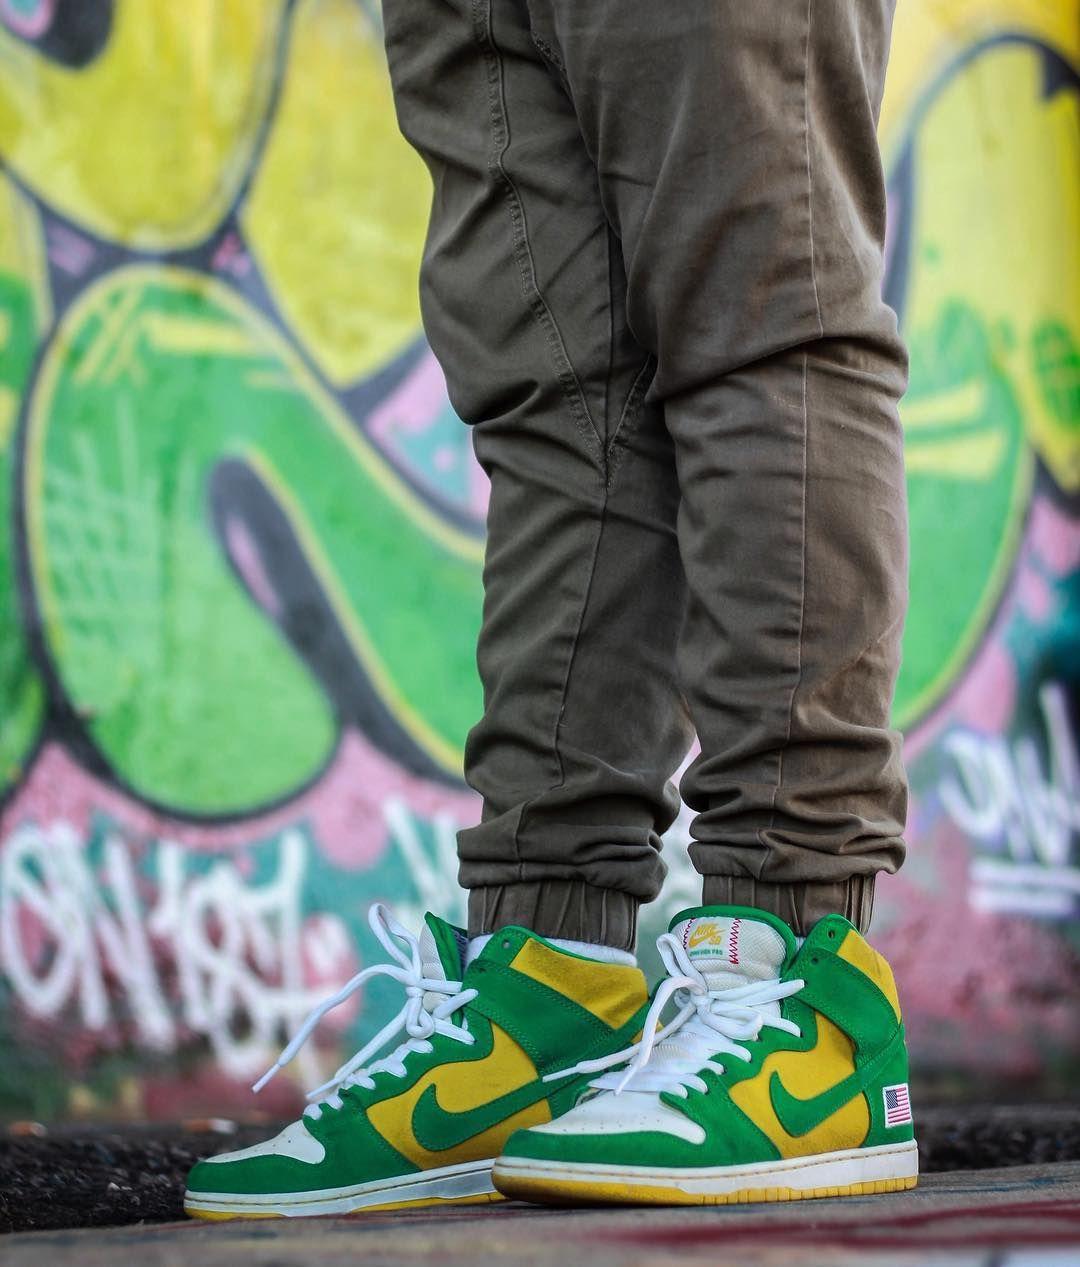 new product dabcd 19514 Anonymous x Unheardof x Nike SB Dunk High Pro